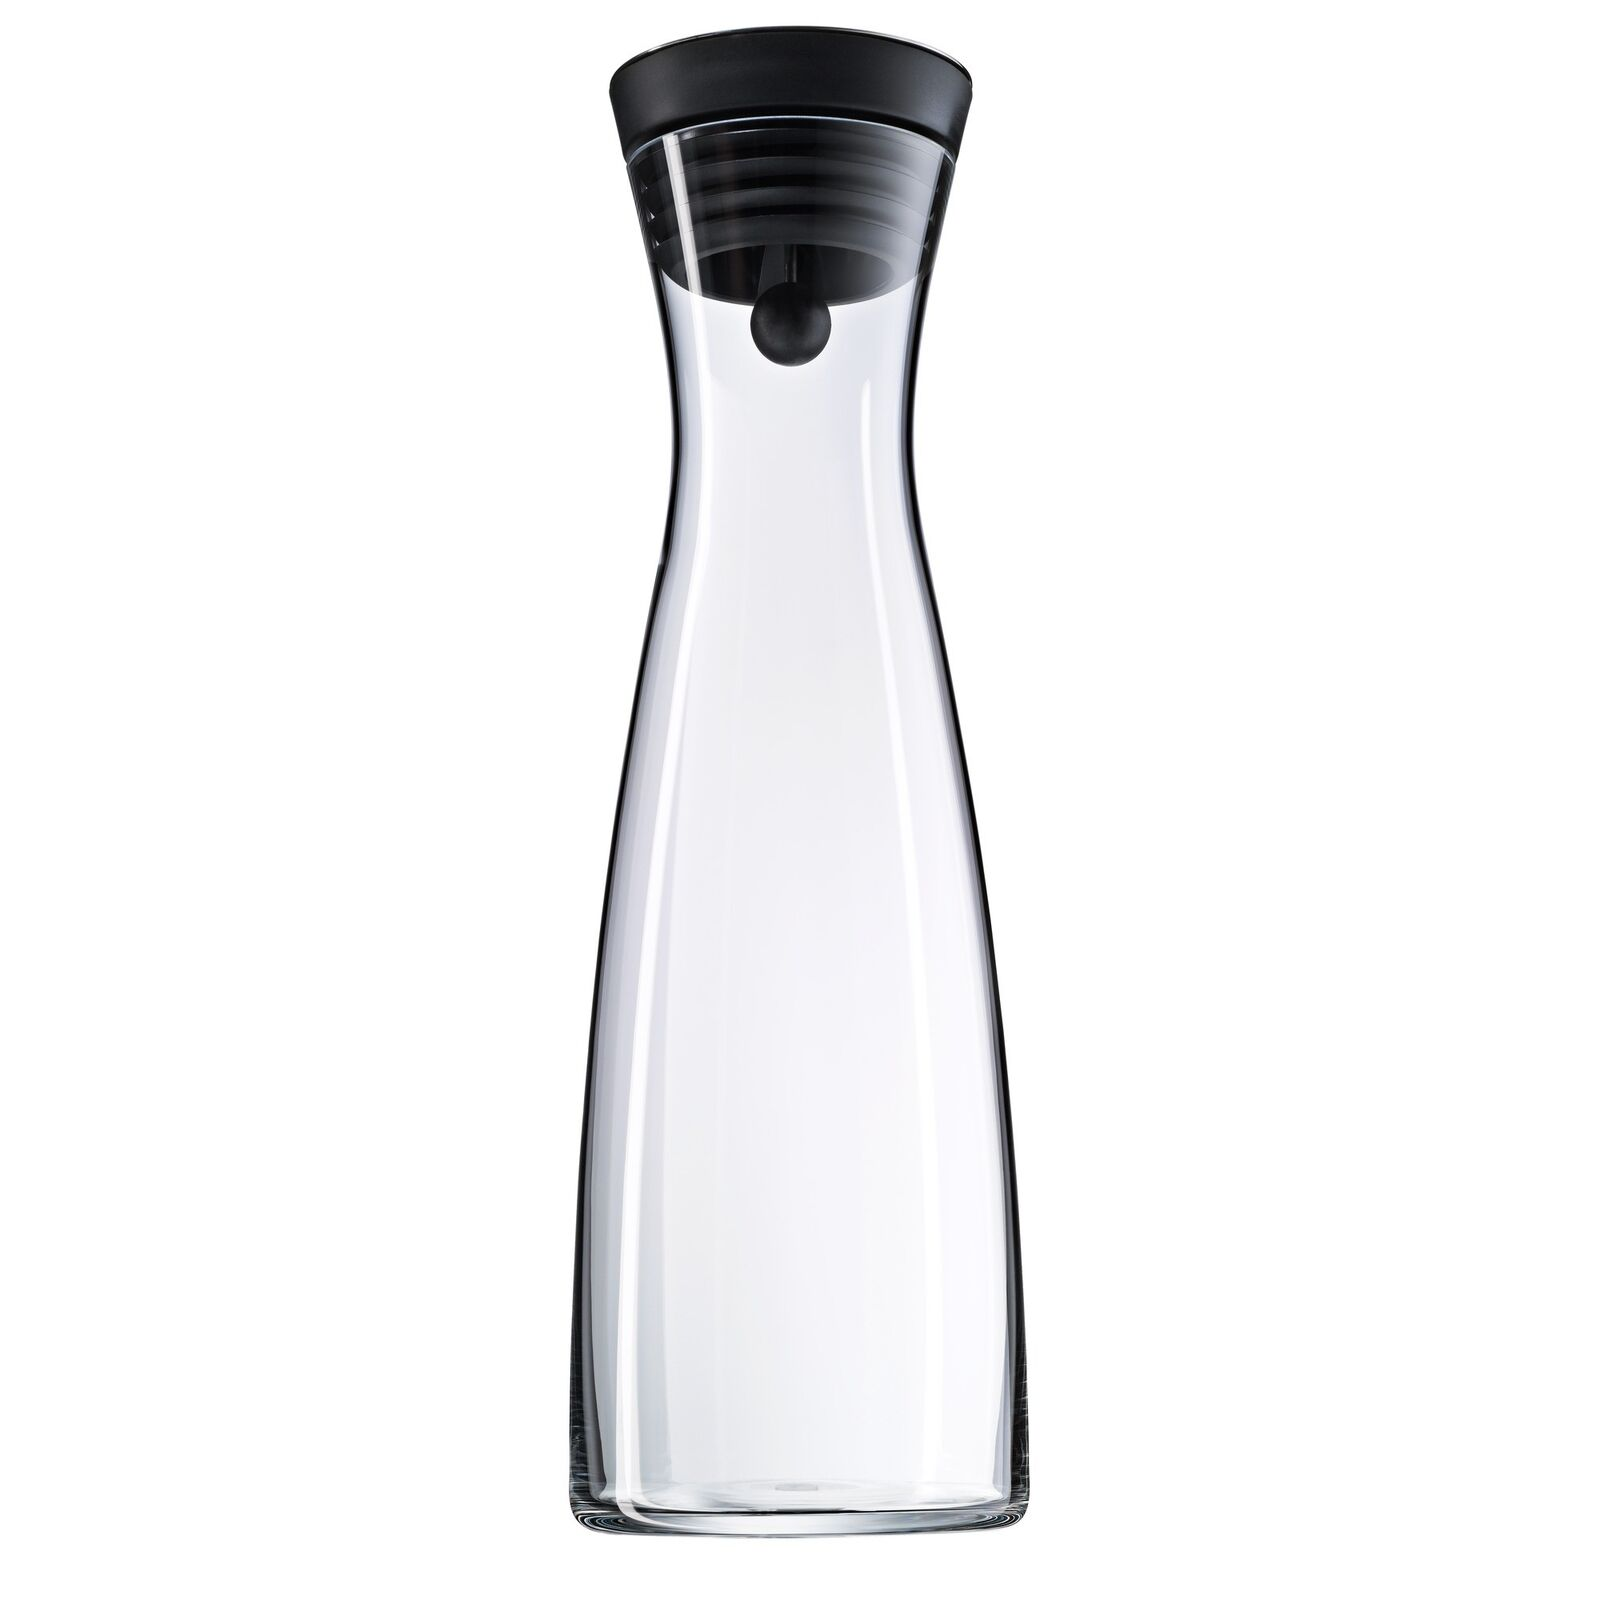 WMF Wasserkaraffe 1,5 l schwarz Basic